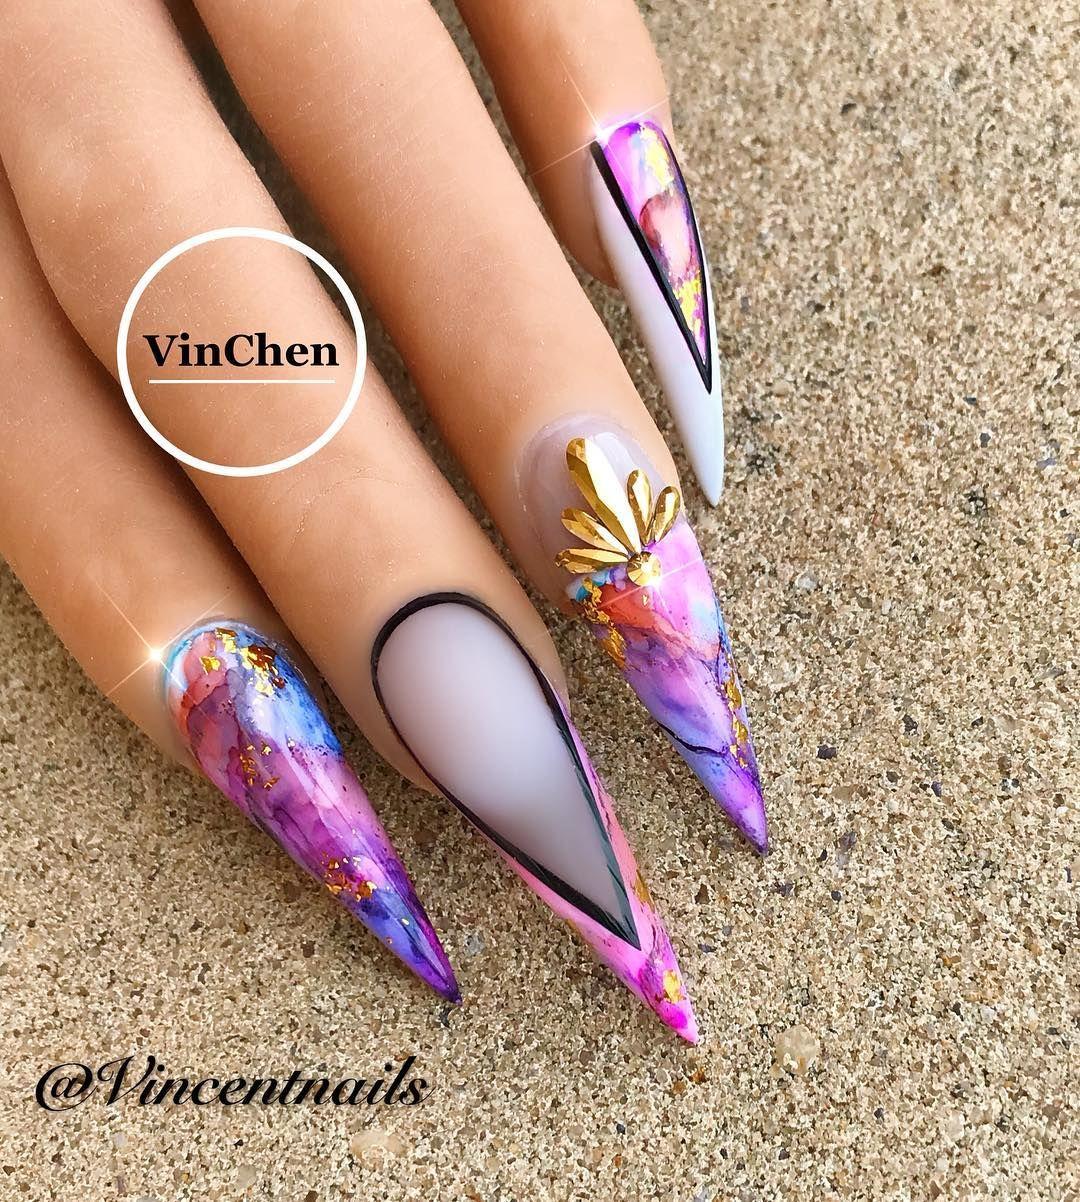 Using Poochieznails Practice Hand From Shopnailszone Com Apresnailofficial Ink For Marble Vch Stiletto Nail Art Stiletto Nails Designs Nail Art Designs